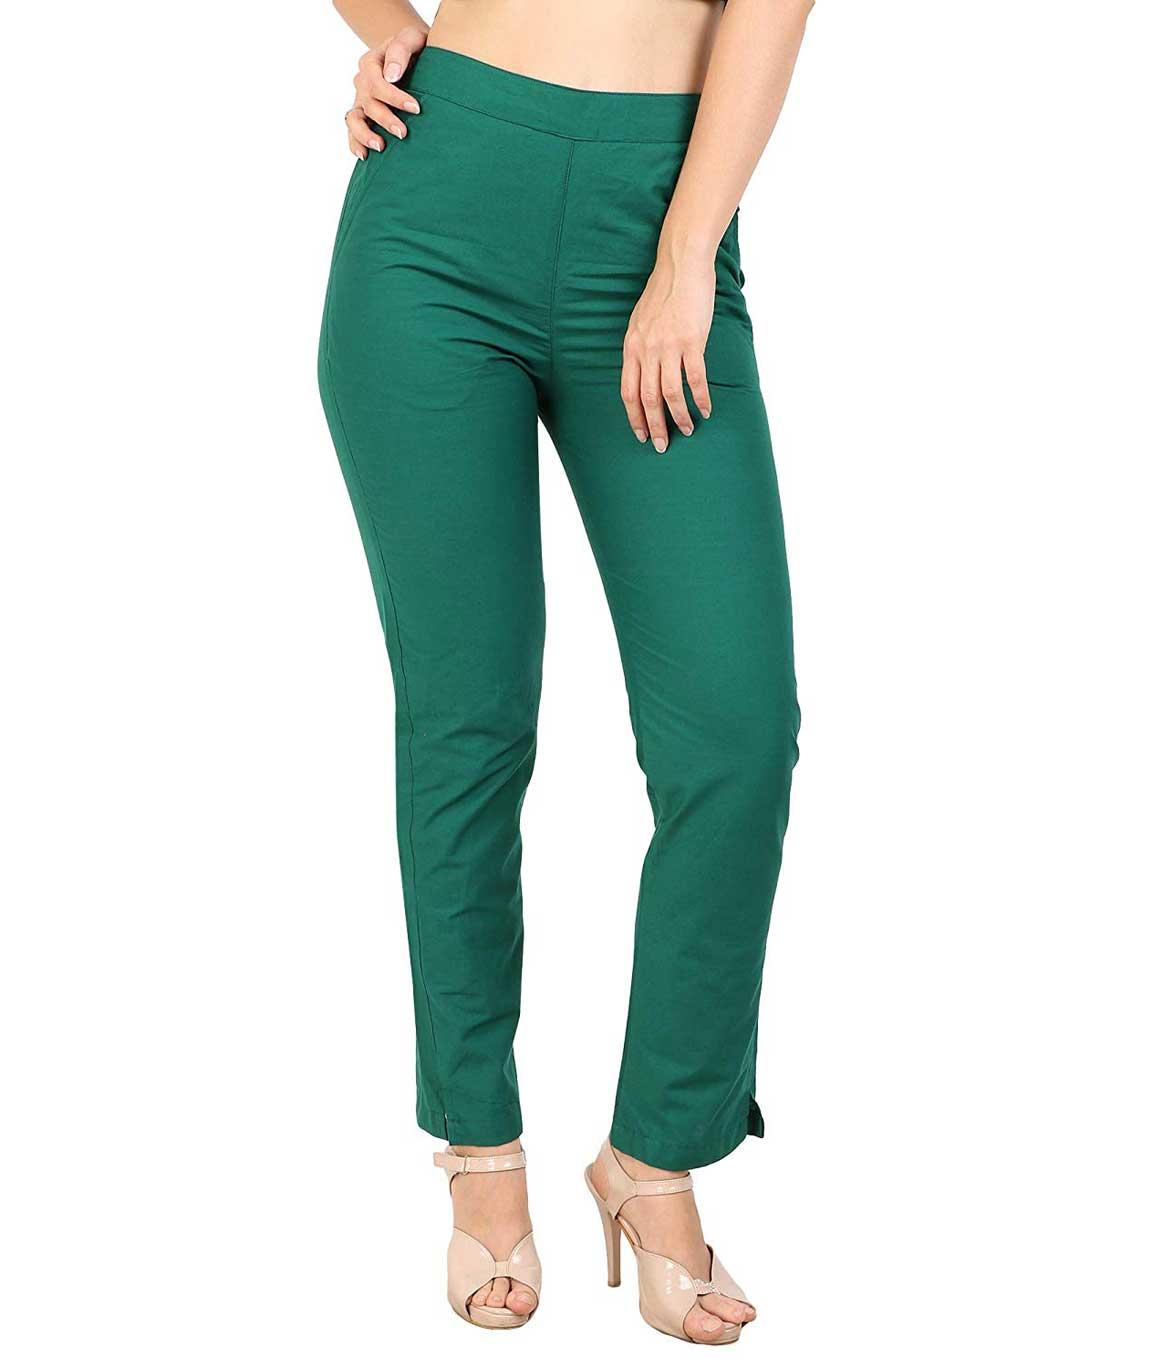 Makxziya Women`s Green Regular Fit Cotton Trouser(Green)